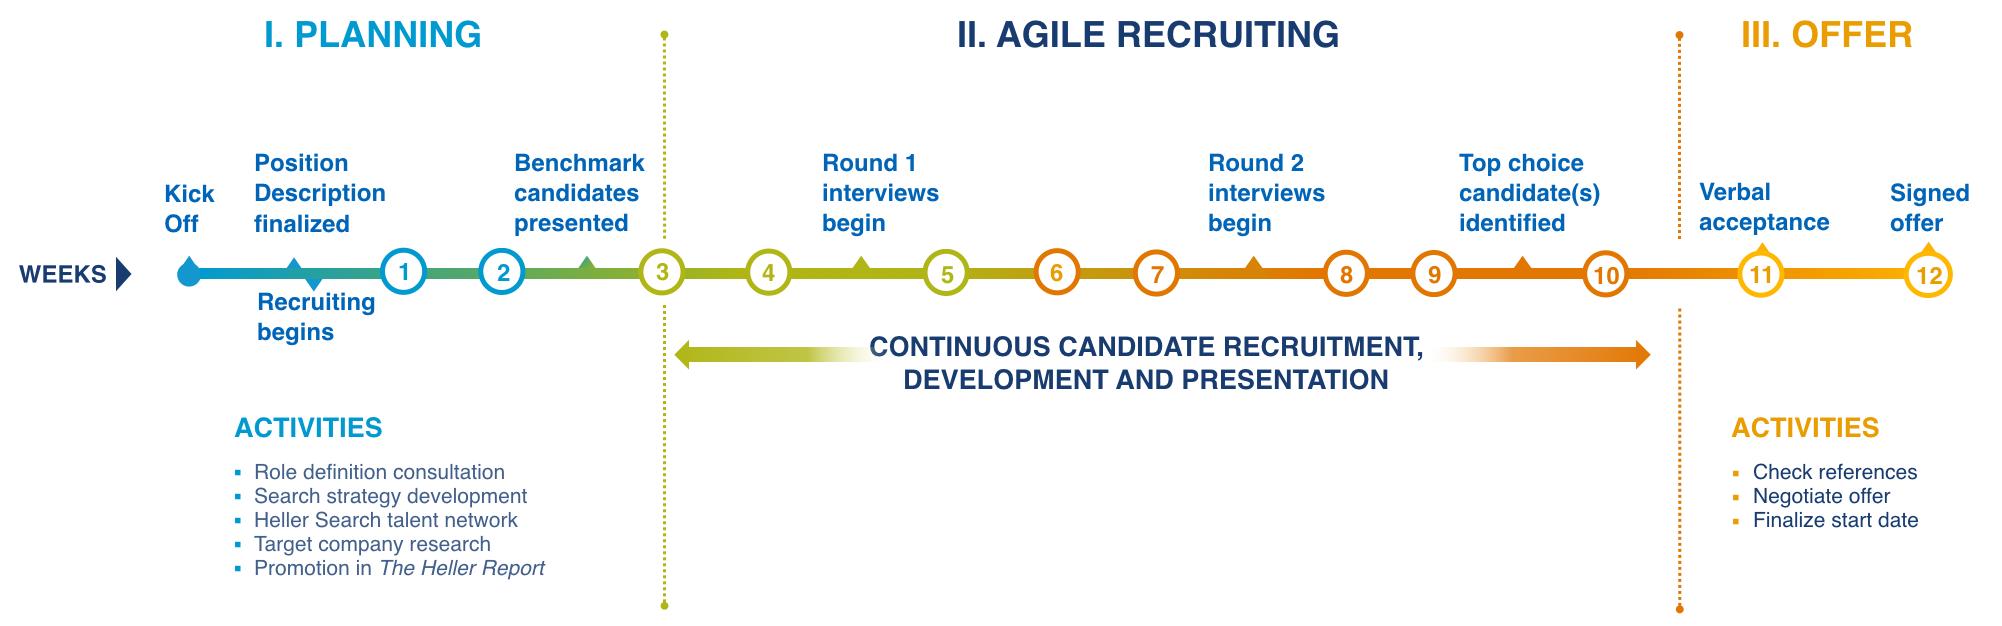 IT recruiting process